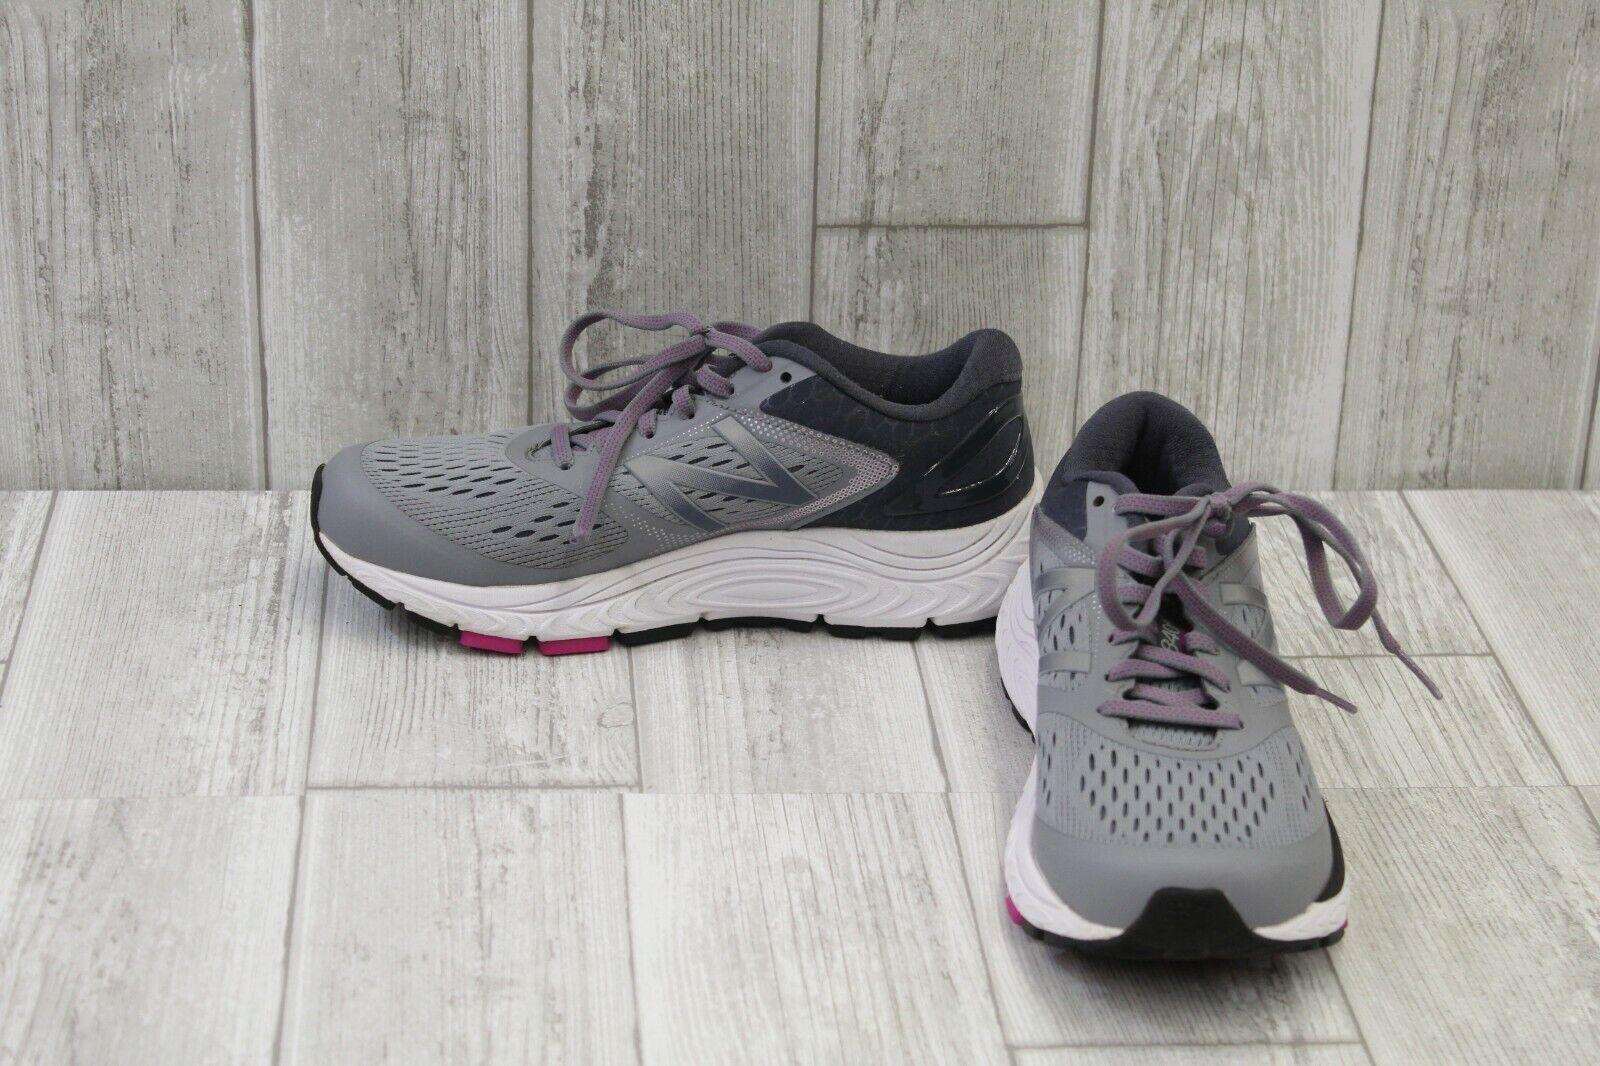 New balance 840v4 Zapatillas Para Correr-Para Mujer B-gris Azul marino púrpura